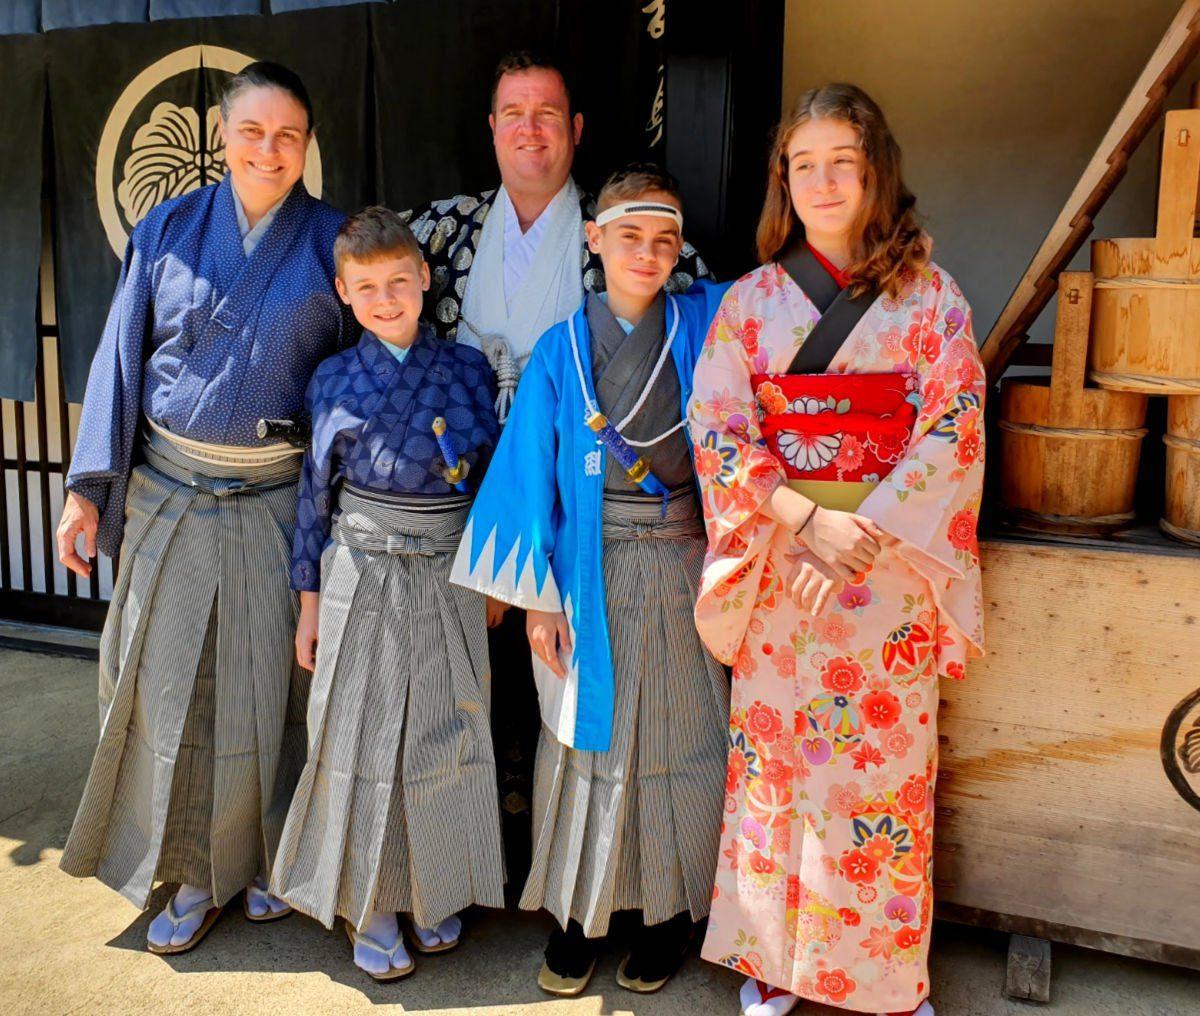 Edo Wonderland Family in Kimonos